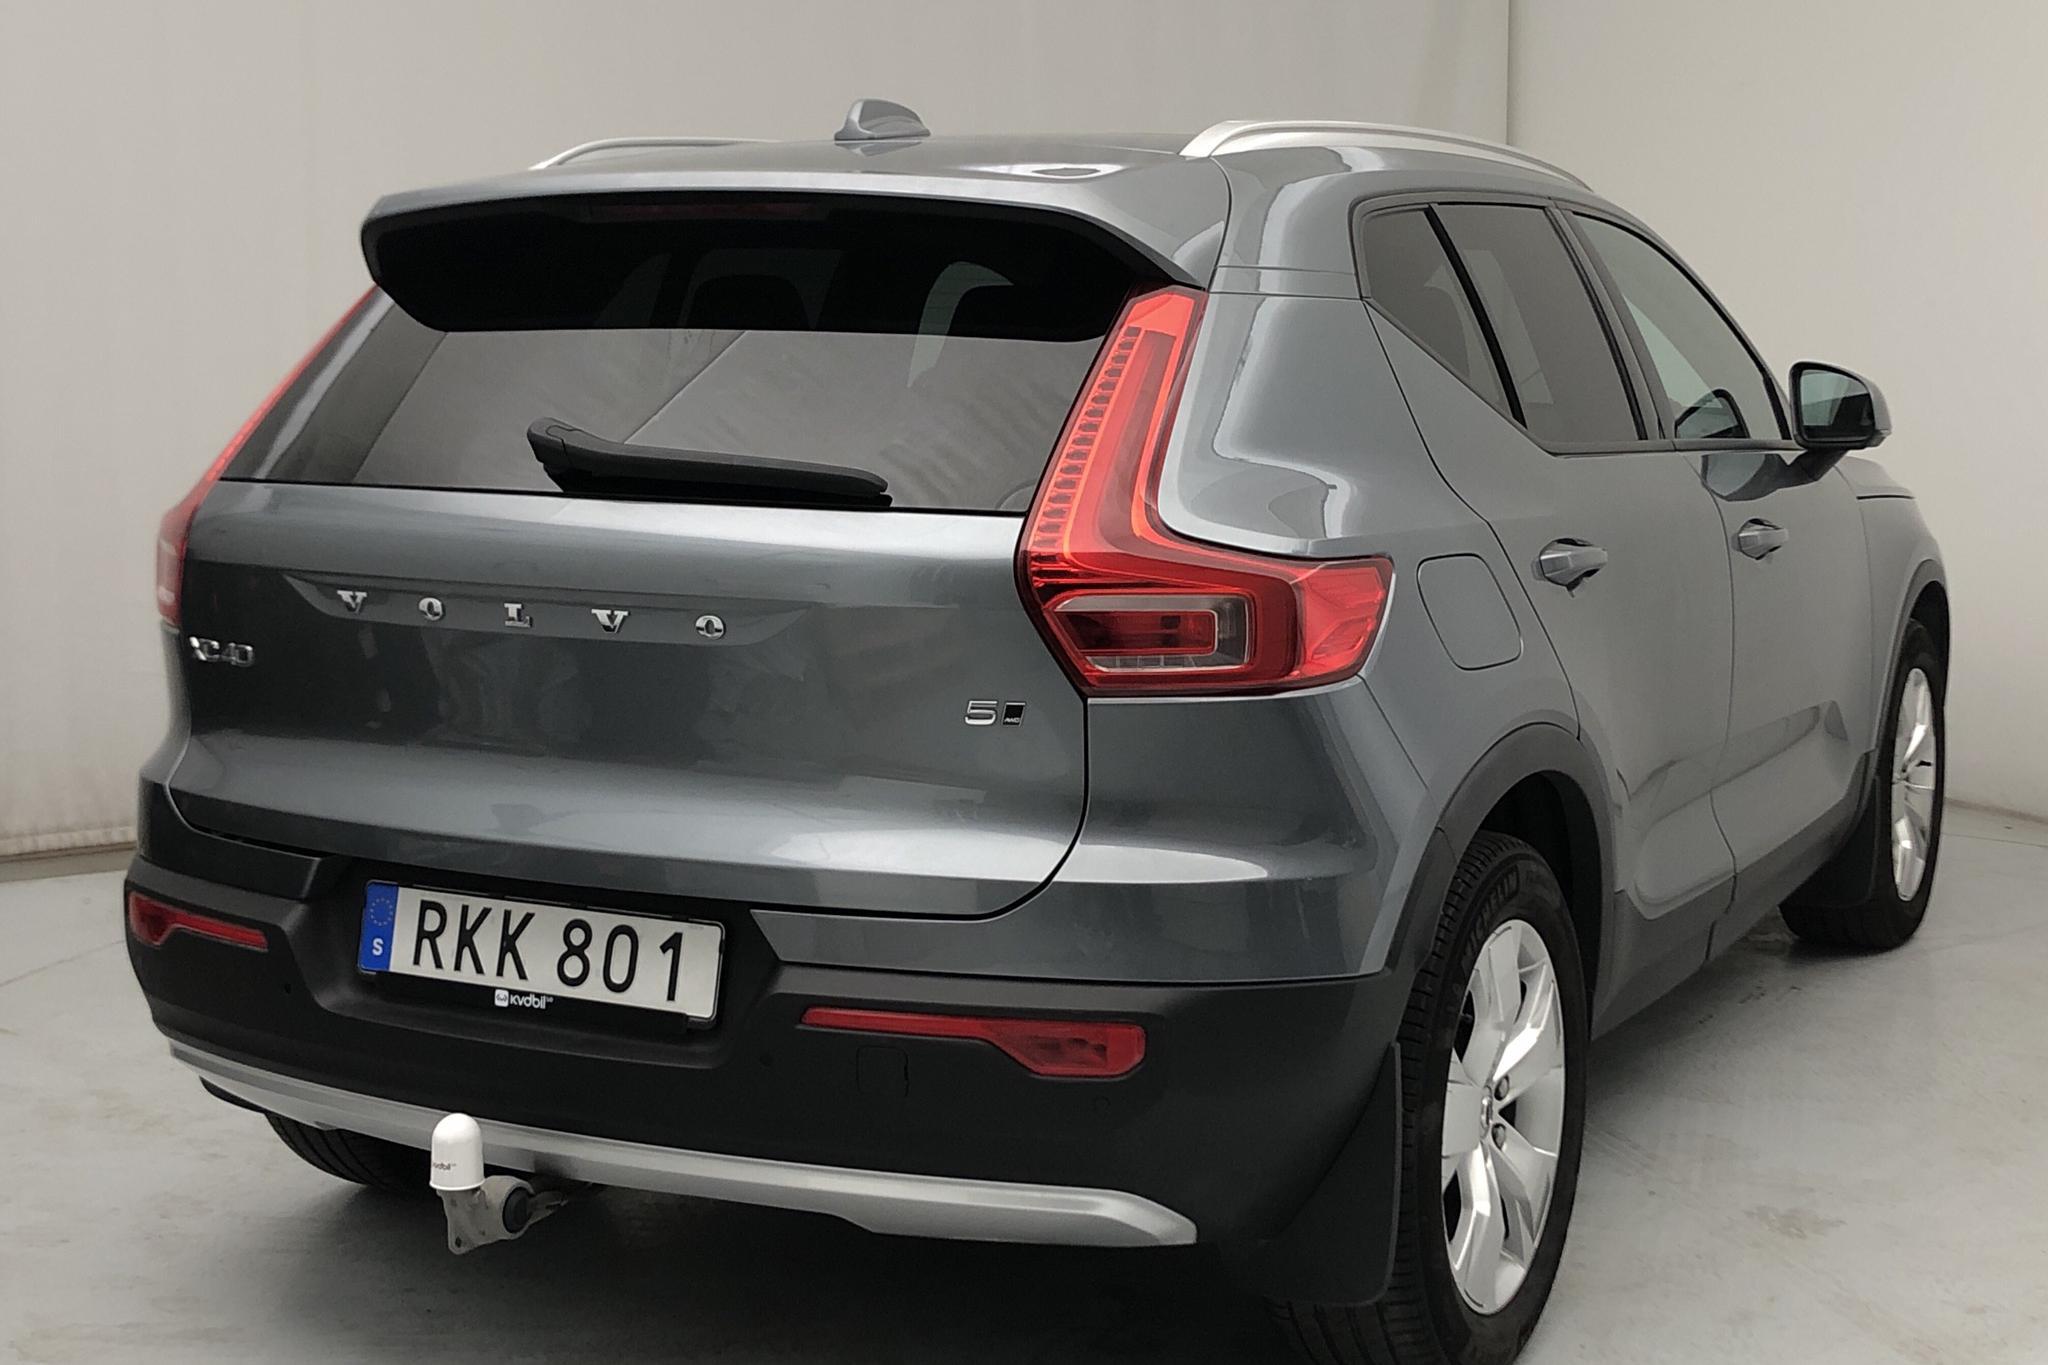 Volvo XC40 T5 AWD (247hk) - 81 180 km - Automatic - gray - 2019